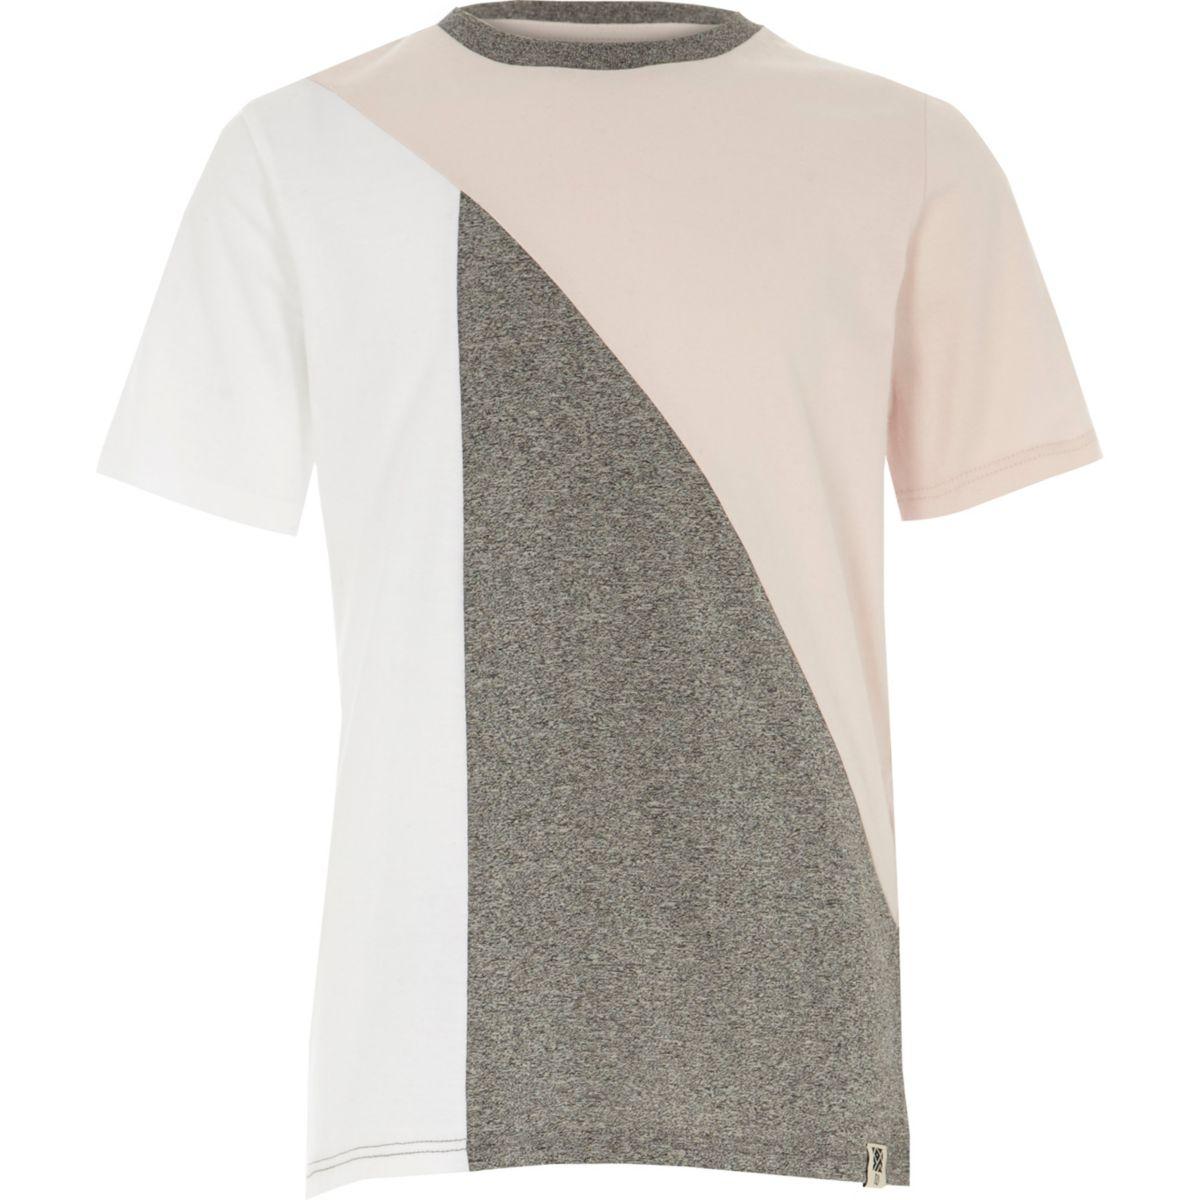 Boys pink and grey block T-shirt